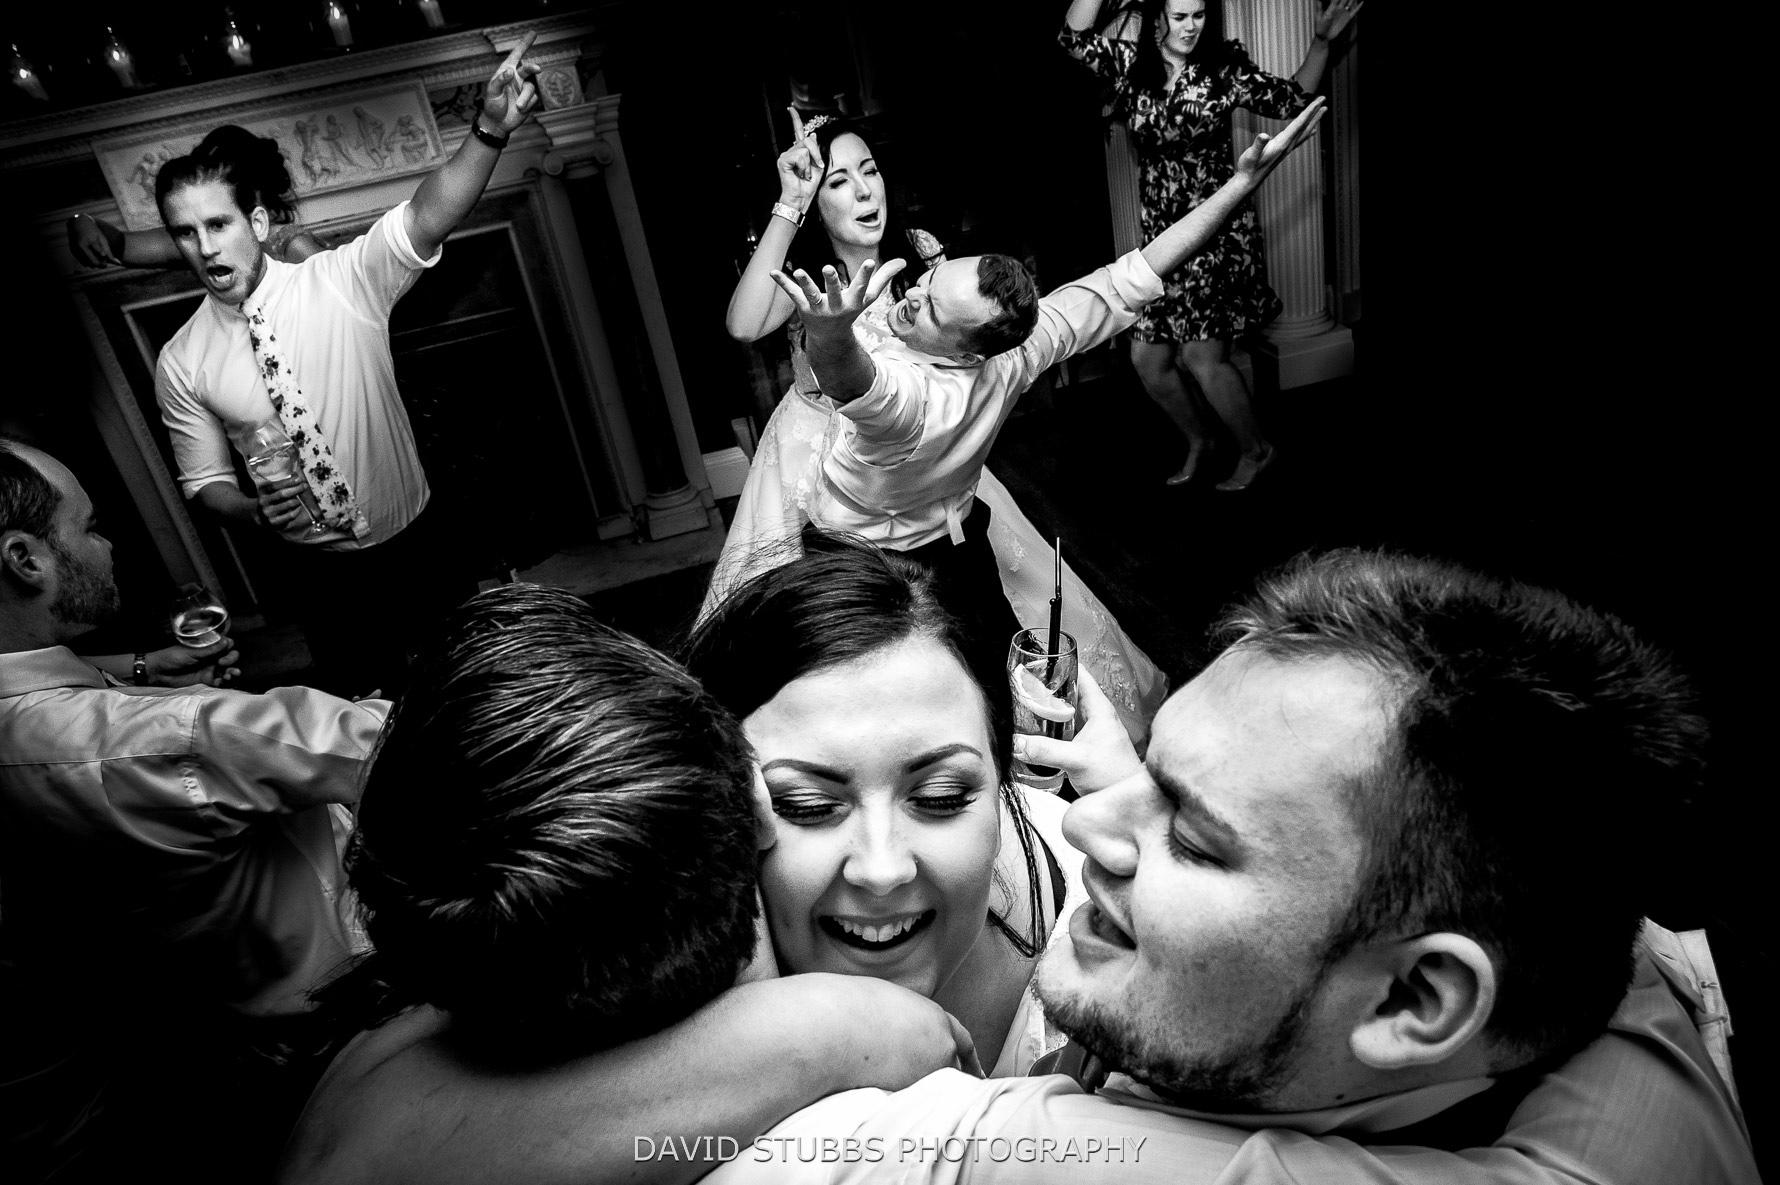 documentary style wedding photograph